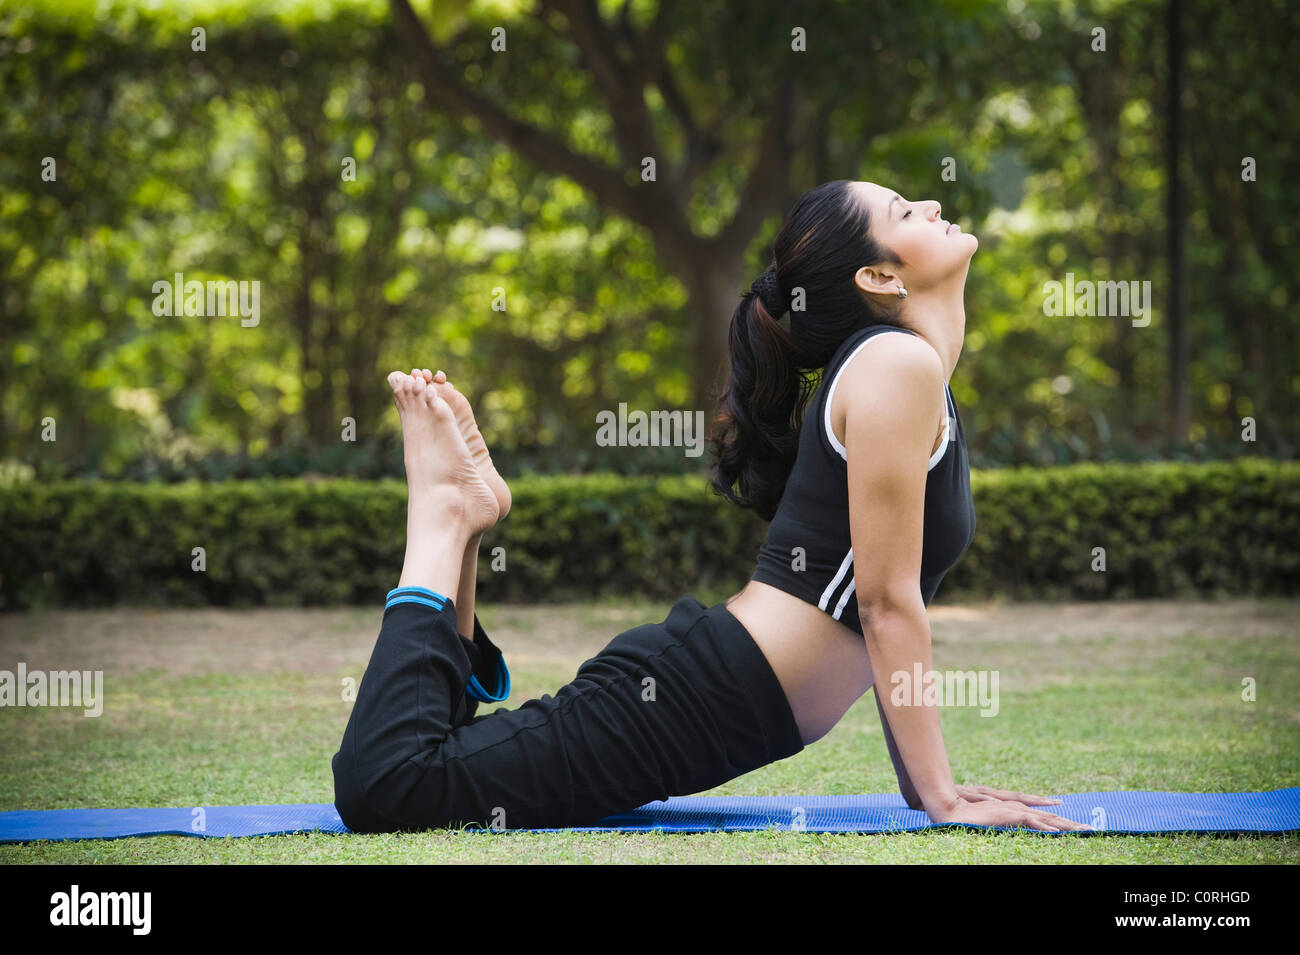 Woman Doing Ardha Bhujangasana Half Cobra Pose